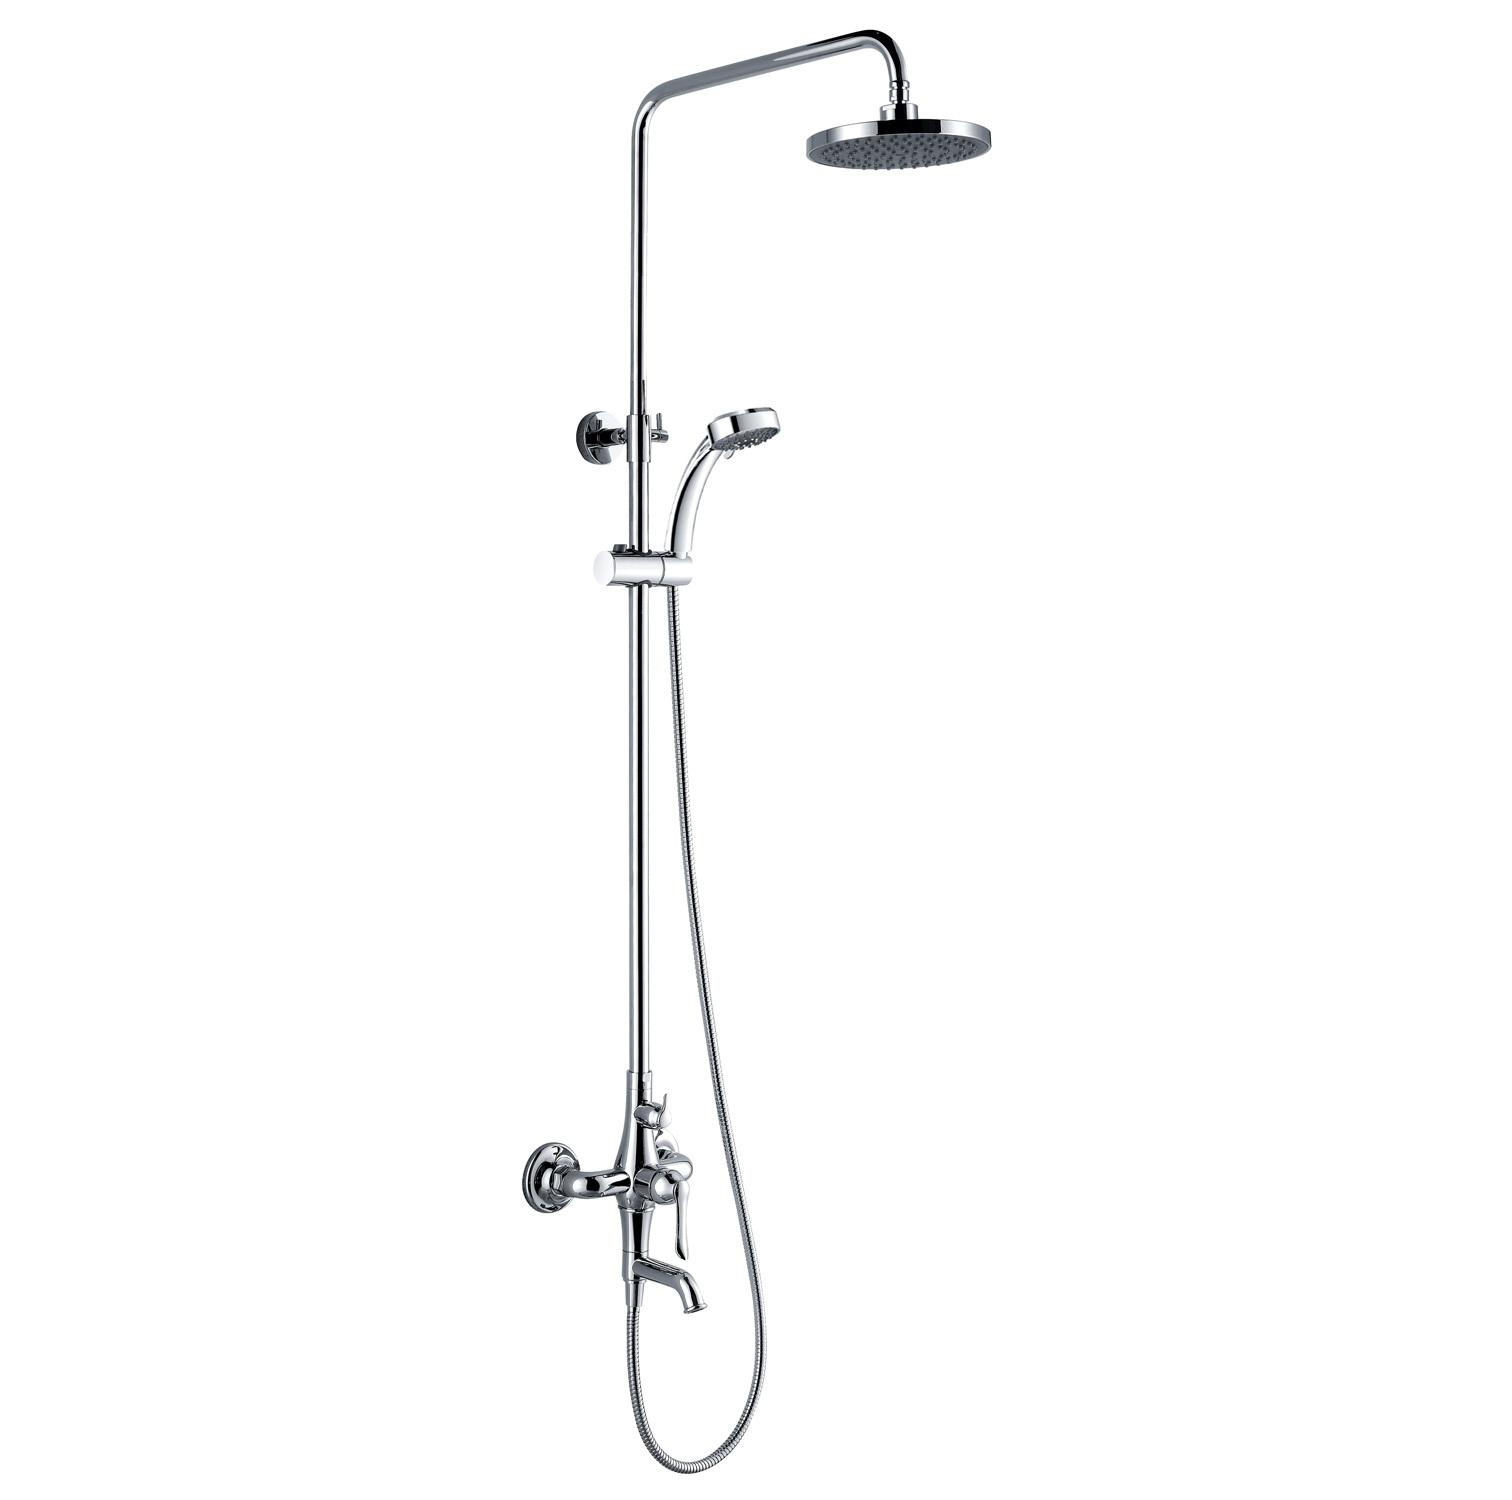 Bộ sen cây tắm G19097